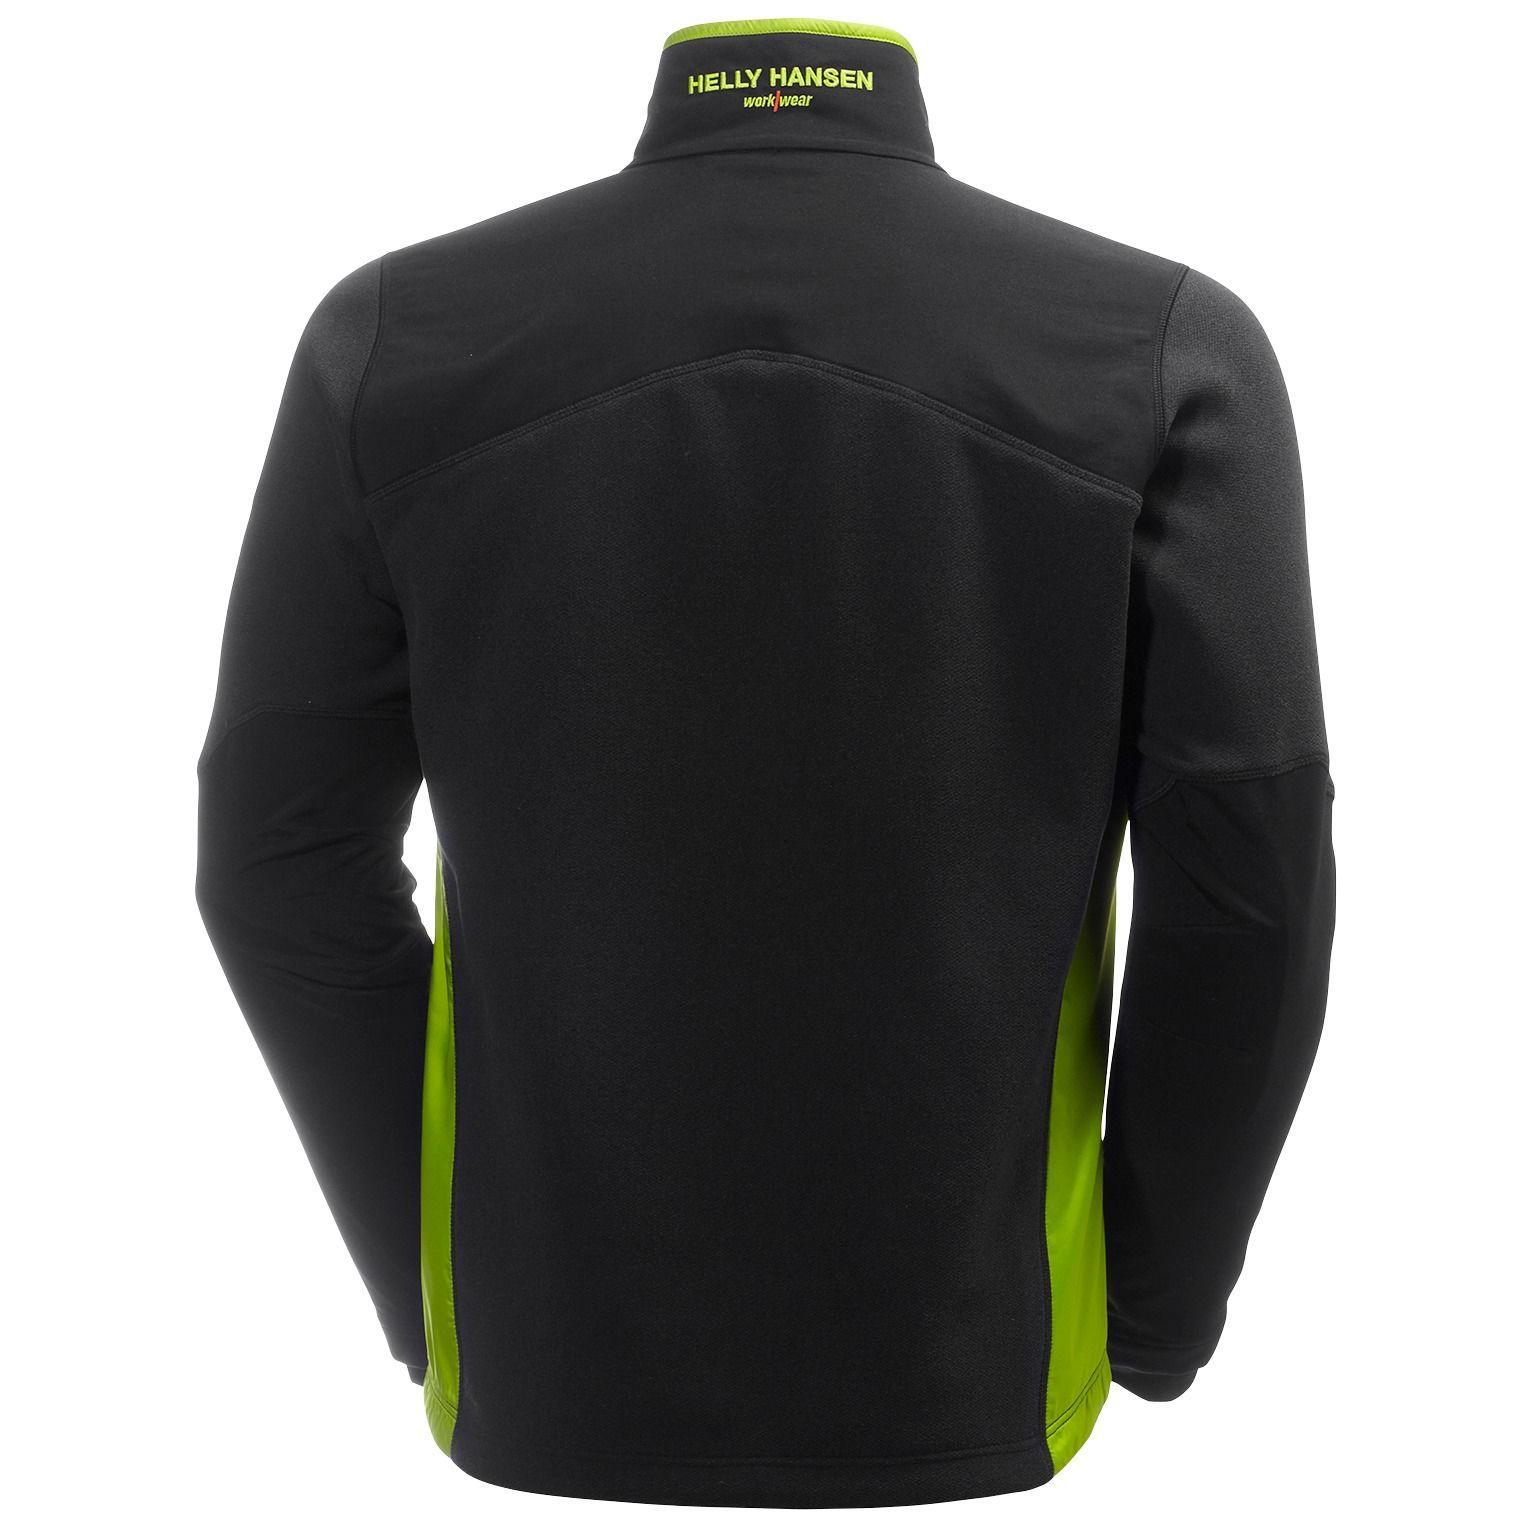 5e40f2dc magni fleece jacket/arbeidstøy/arbeidsjakke/helly hansen/haugseng.no